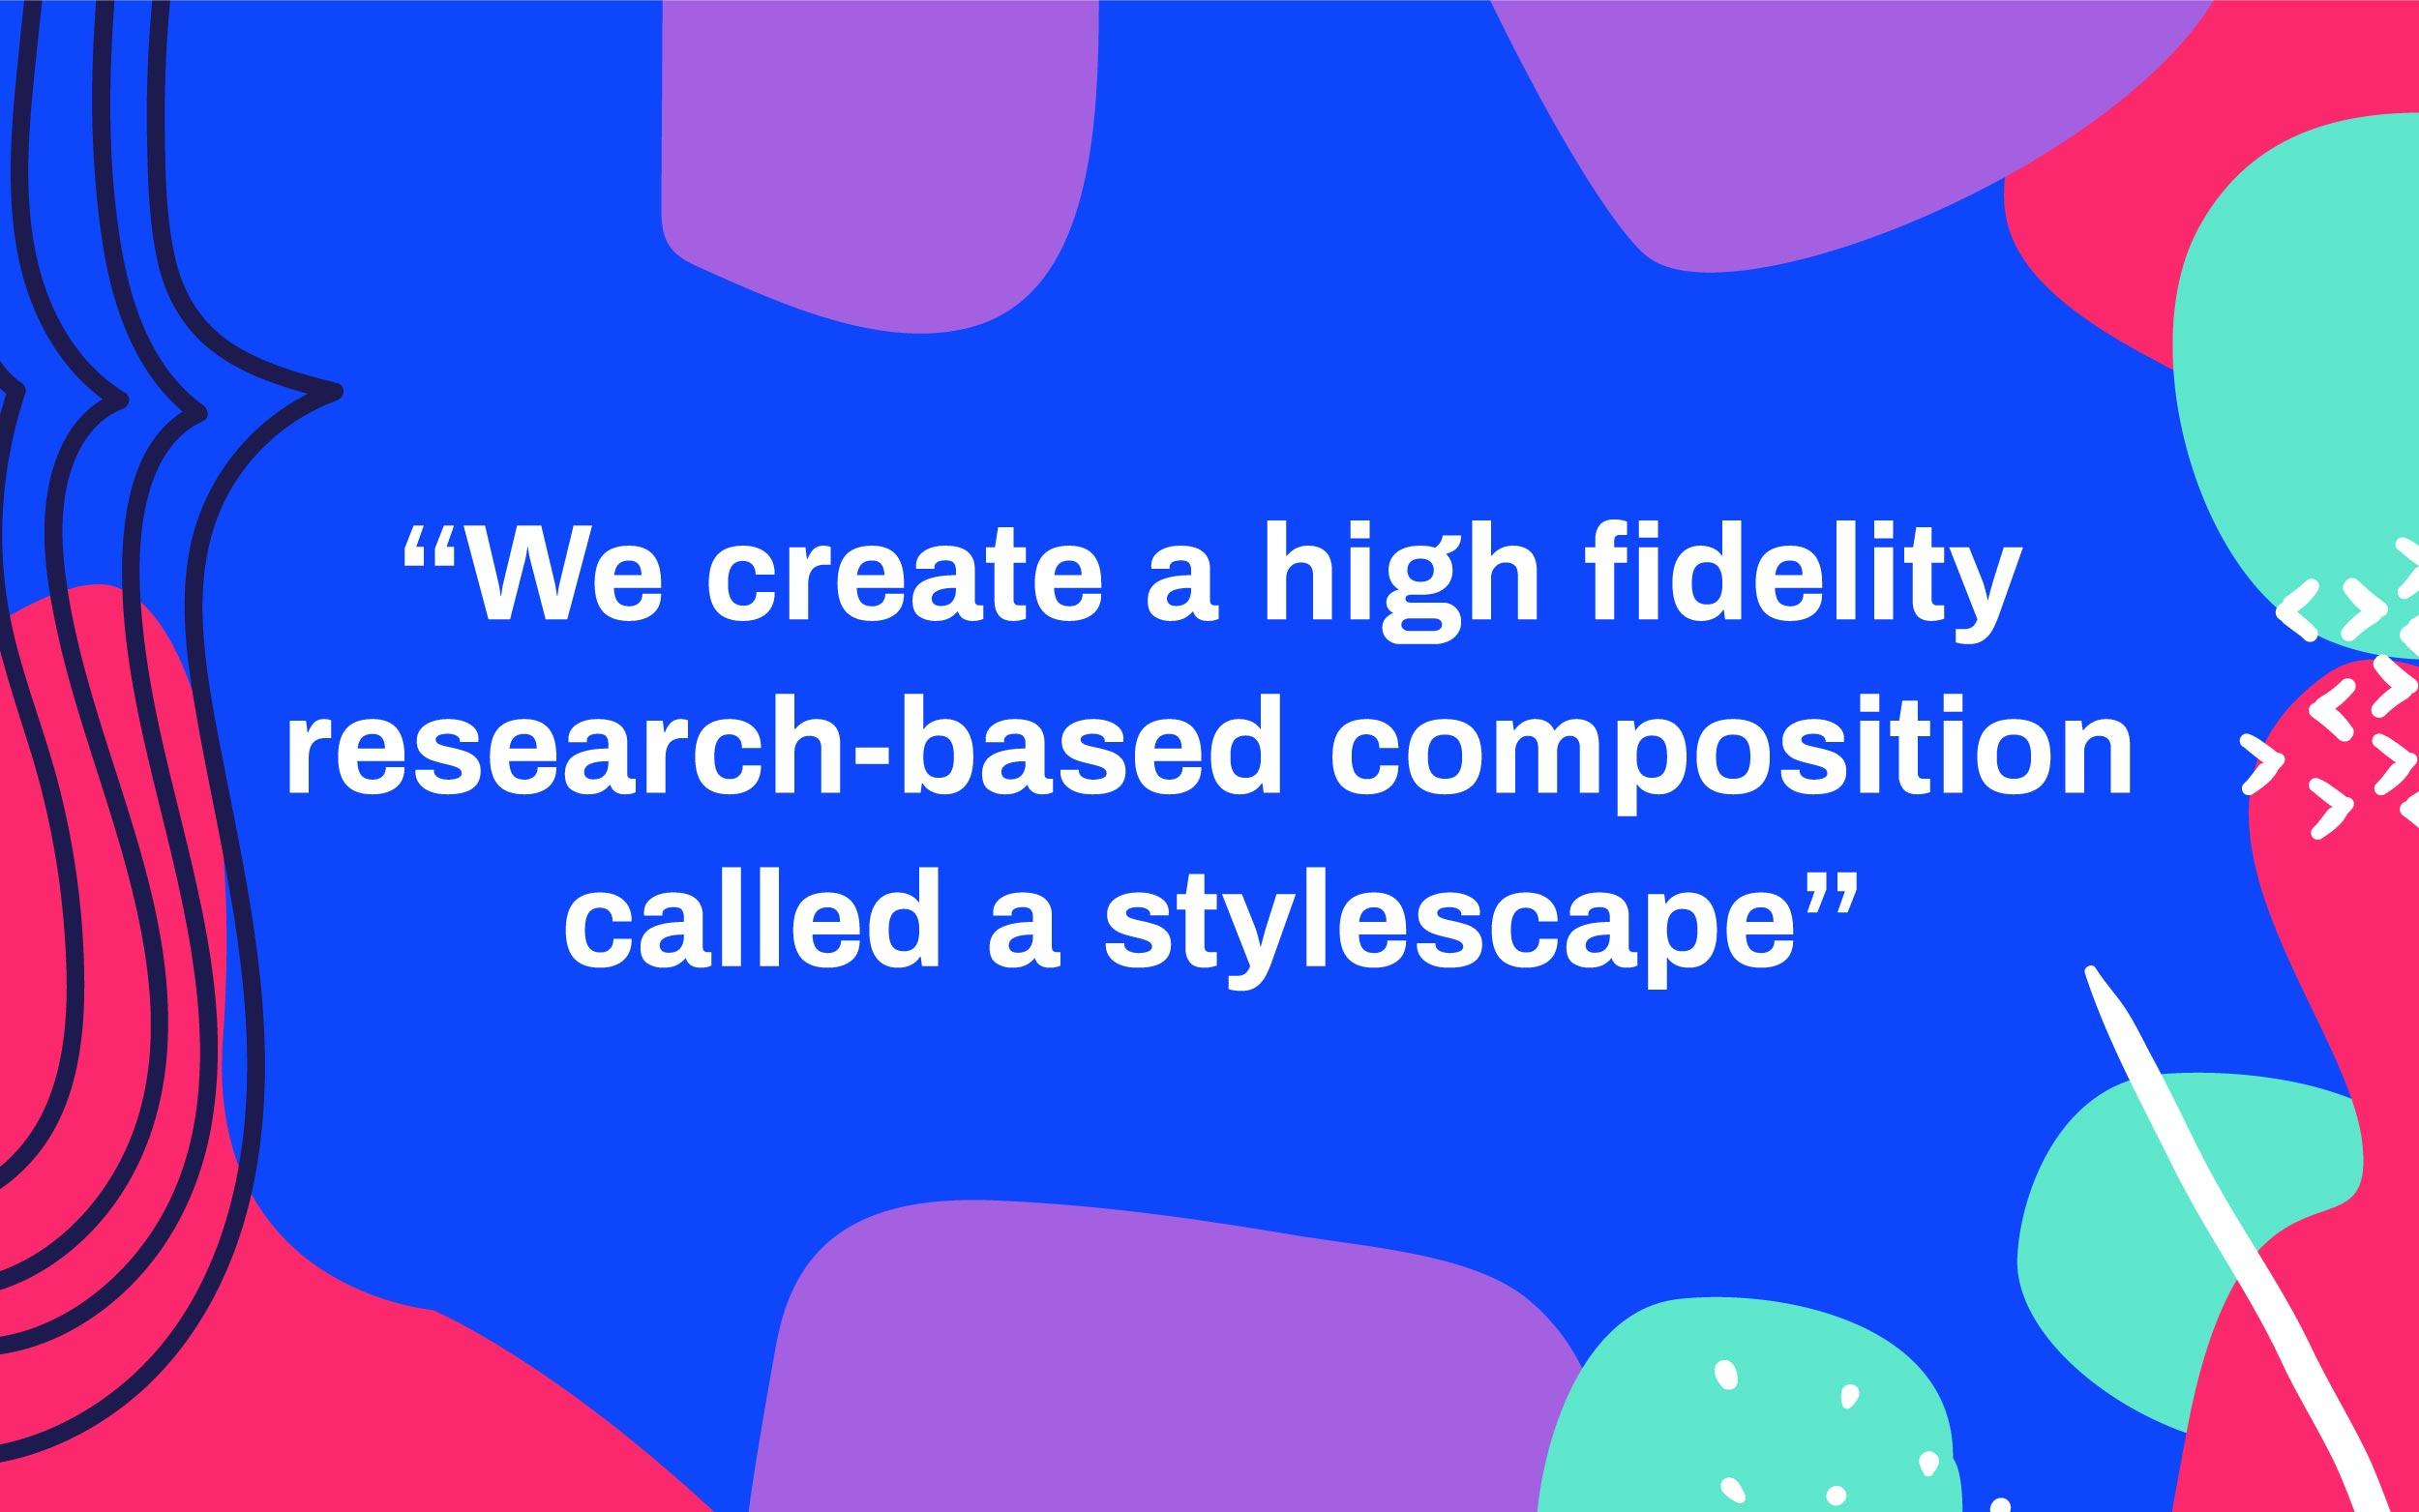 stylescape quote